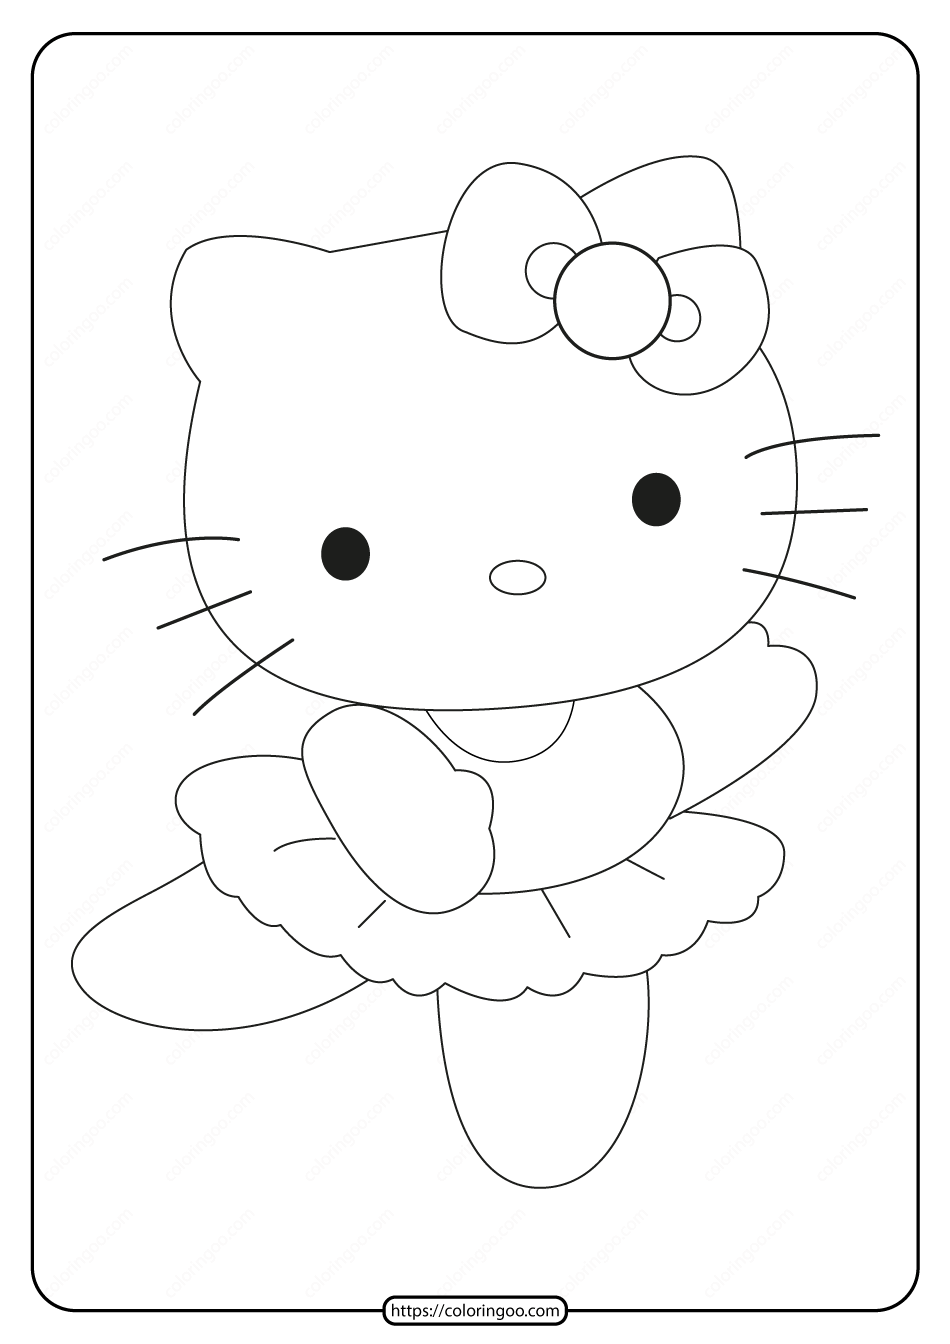 Printable Ballerina Hello Kitty Coloring Page